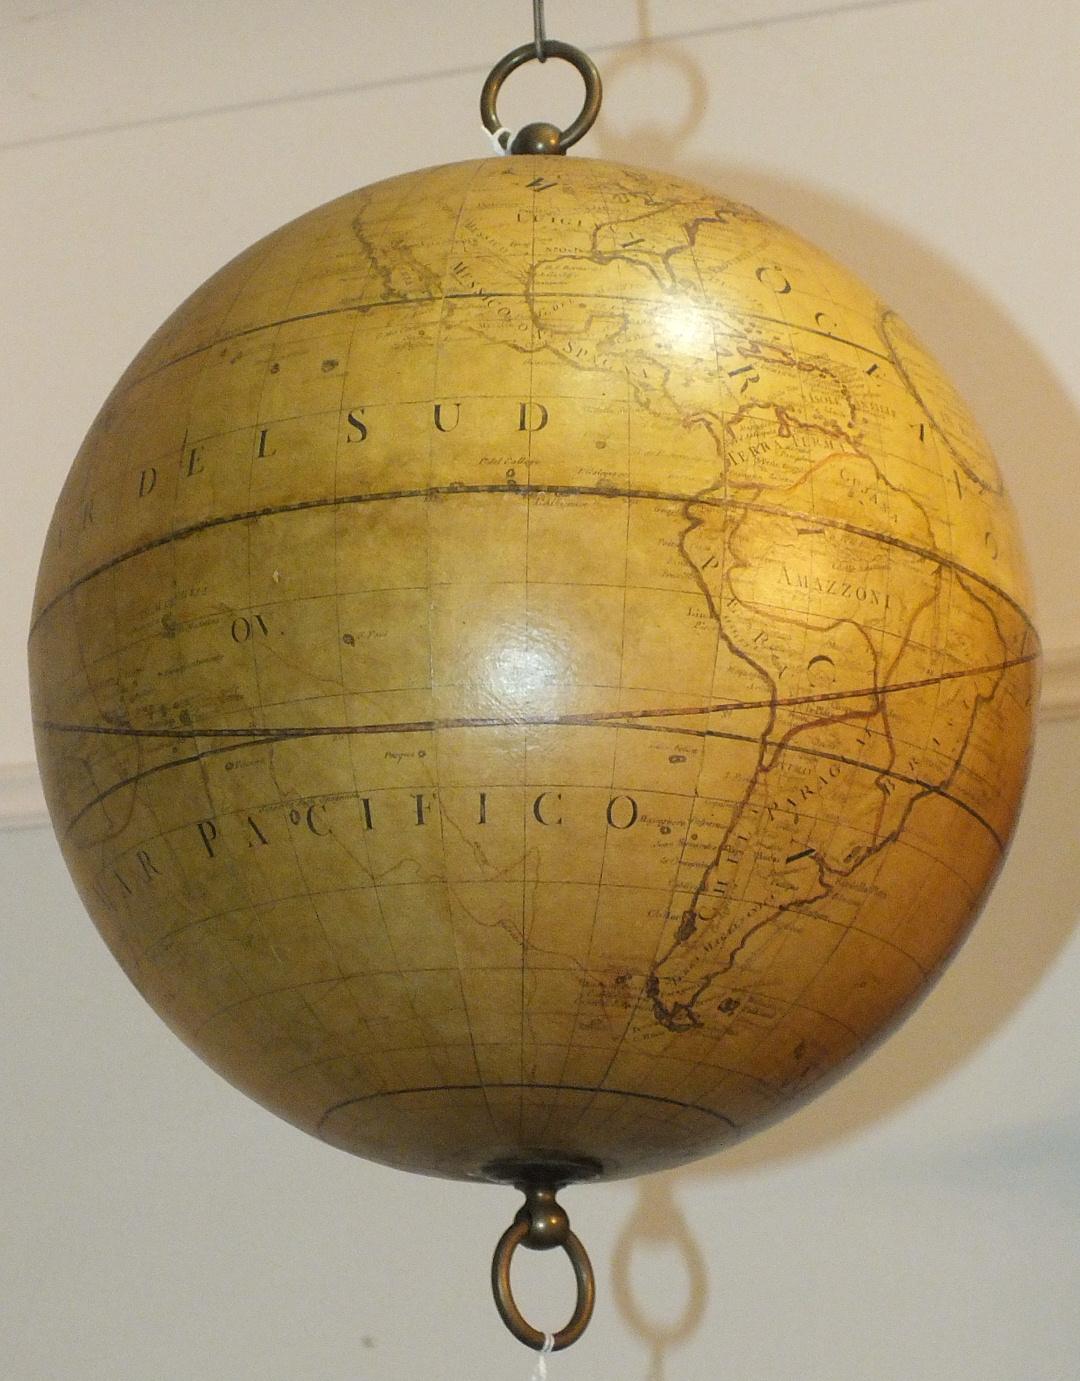 Lot 318 - Greaves & Thomas Globe Terrestré, a reproduction hanging terrestrial globe, 32cm diameter, 48cm